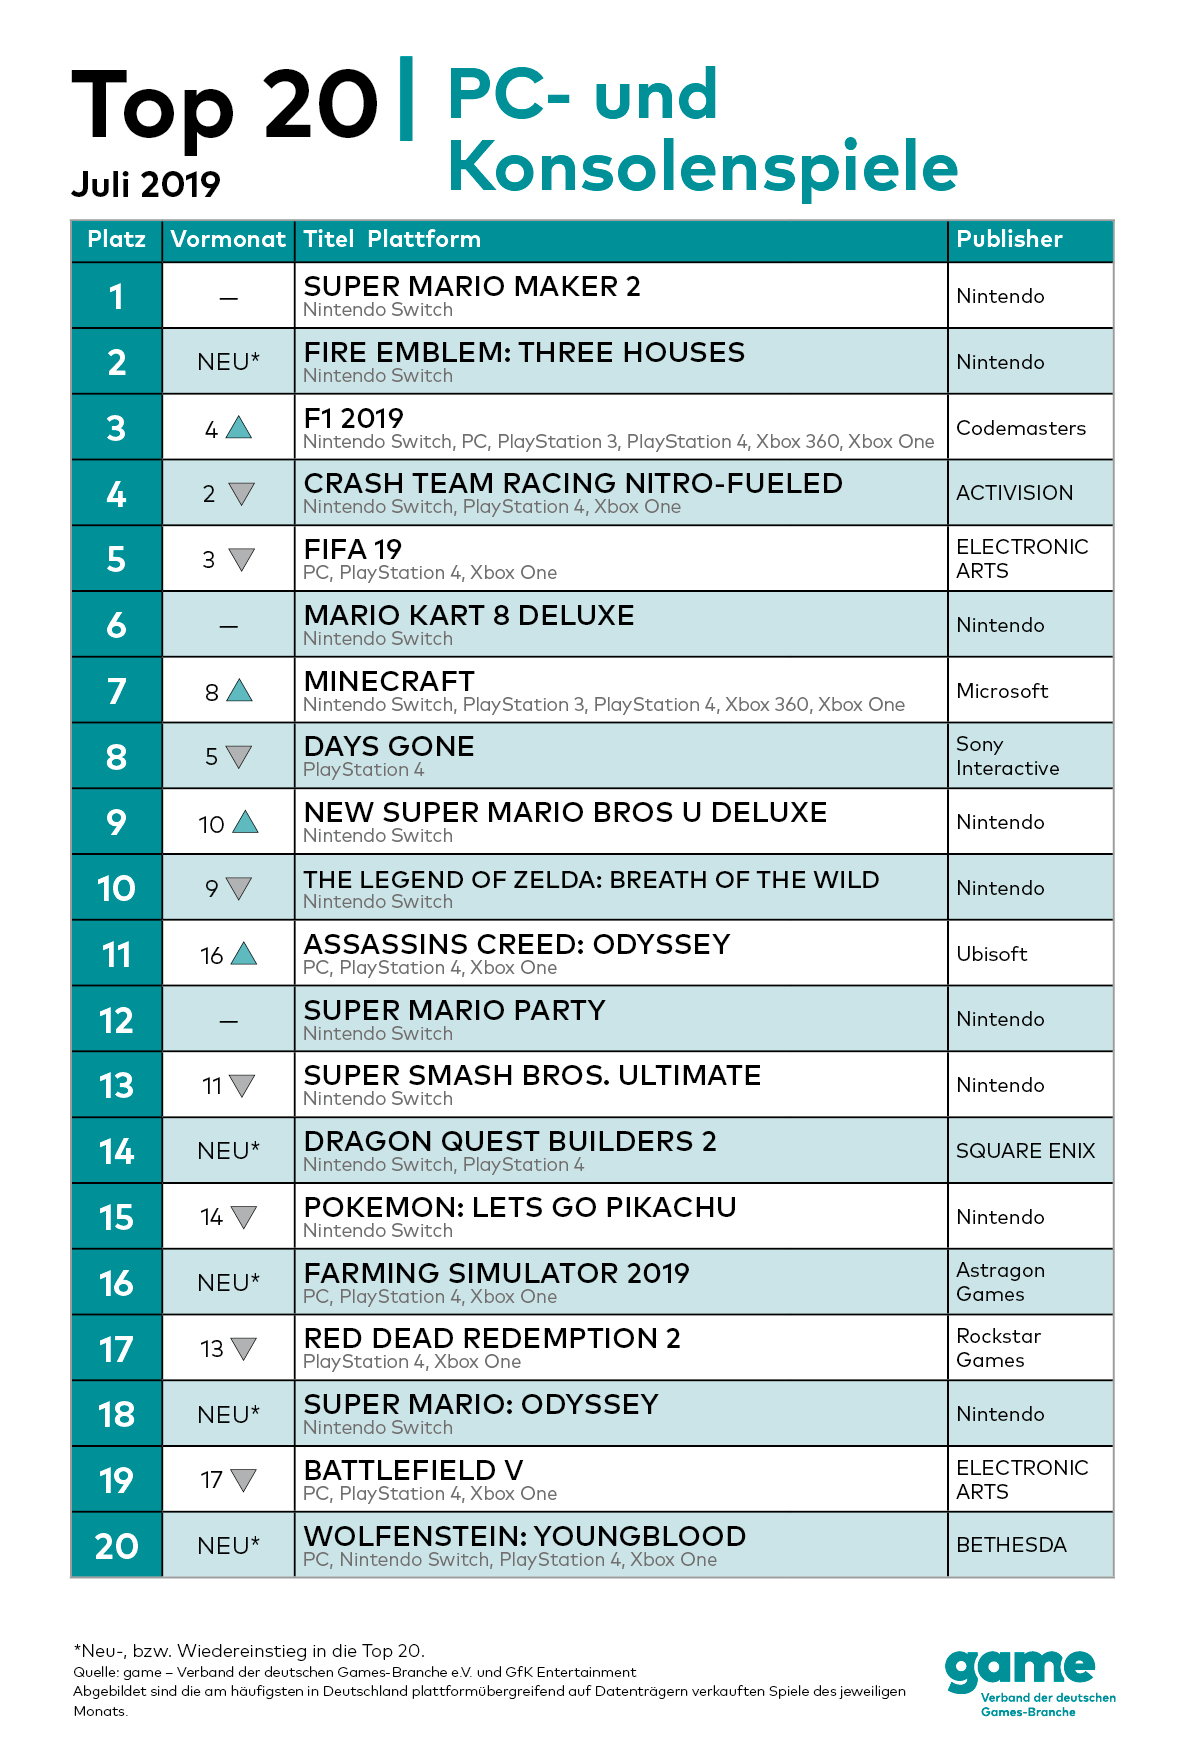 game_PC-Charts_Top20_Juli2019.jpg